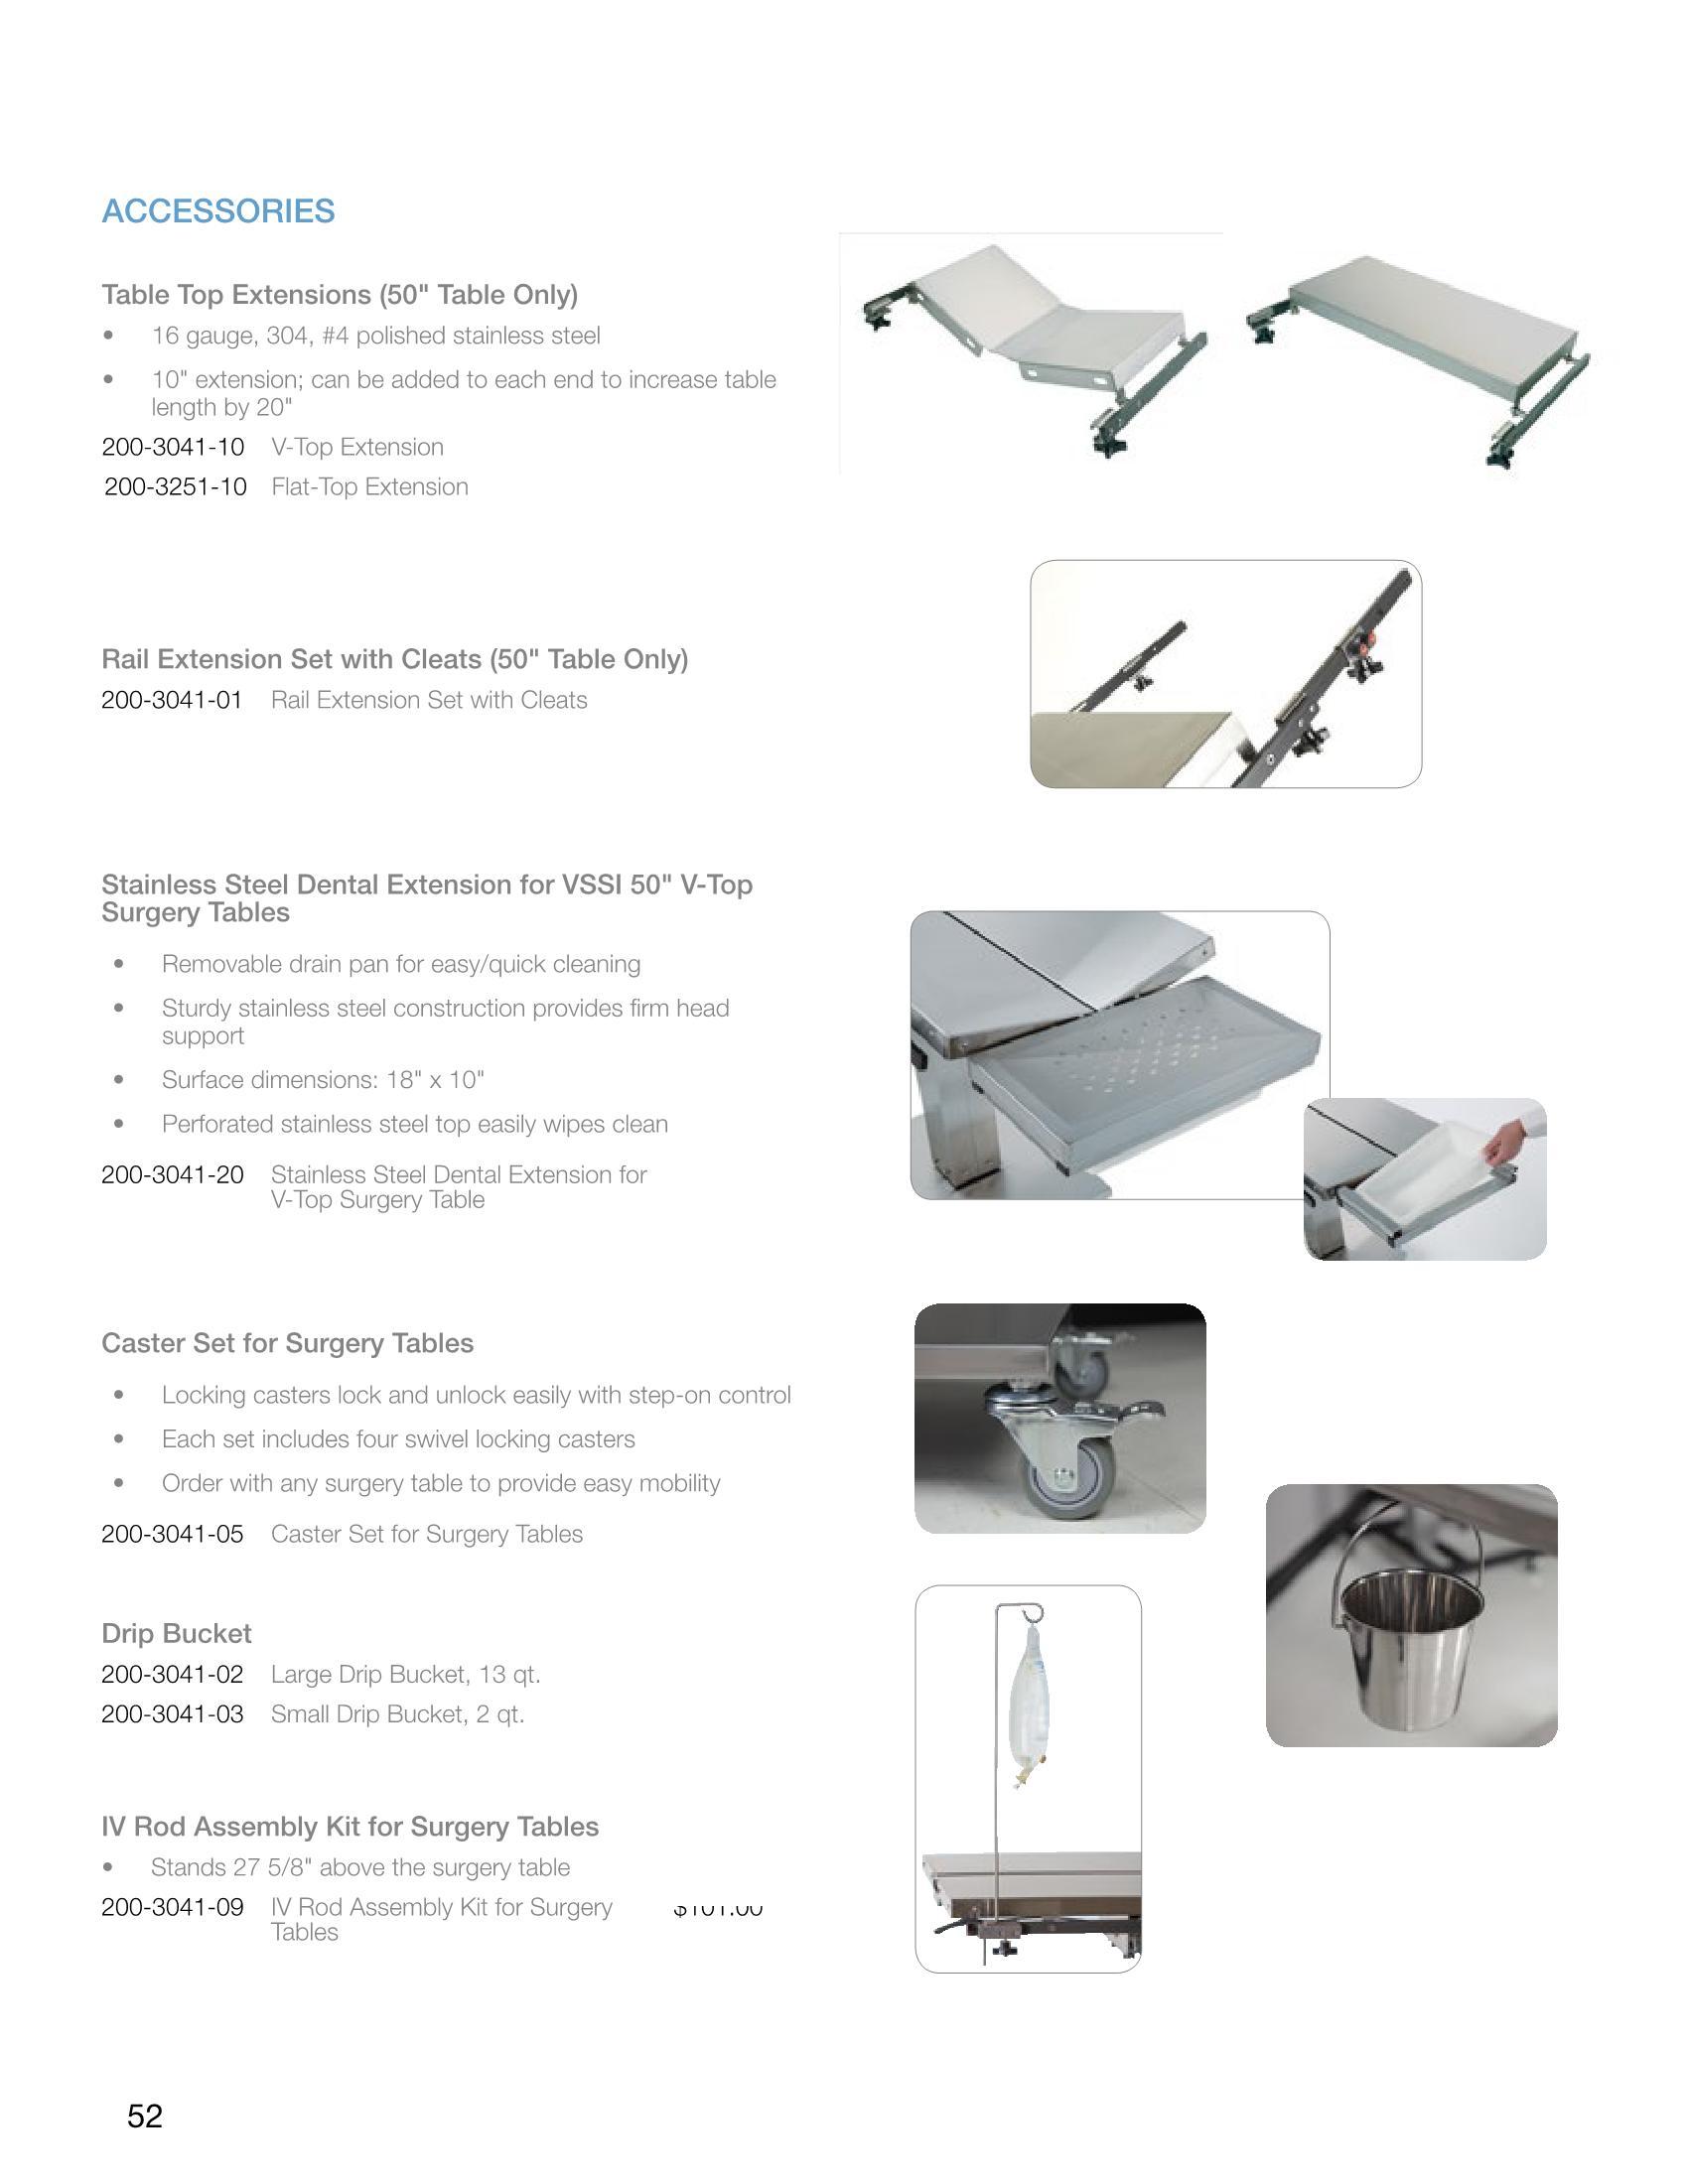 [DIAGRAM_34OR]  Midmark Medical, Dental, Vet Equipment Manufacturer & Supplier-Flip Book  Pages 51-100 | PubHTML5 | Vssi Vet Table Wiring Diagram |  | PubHTML5